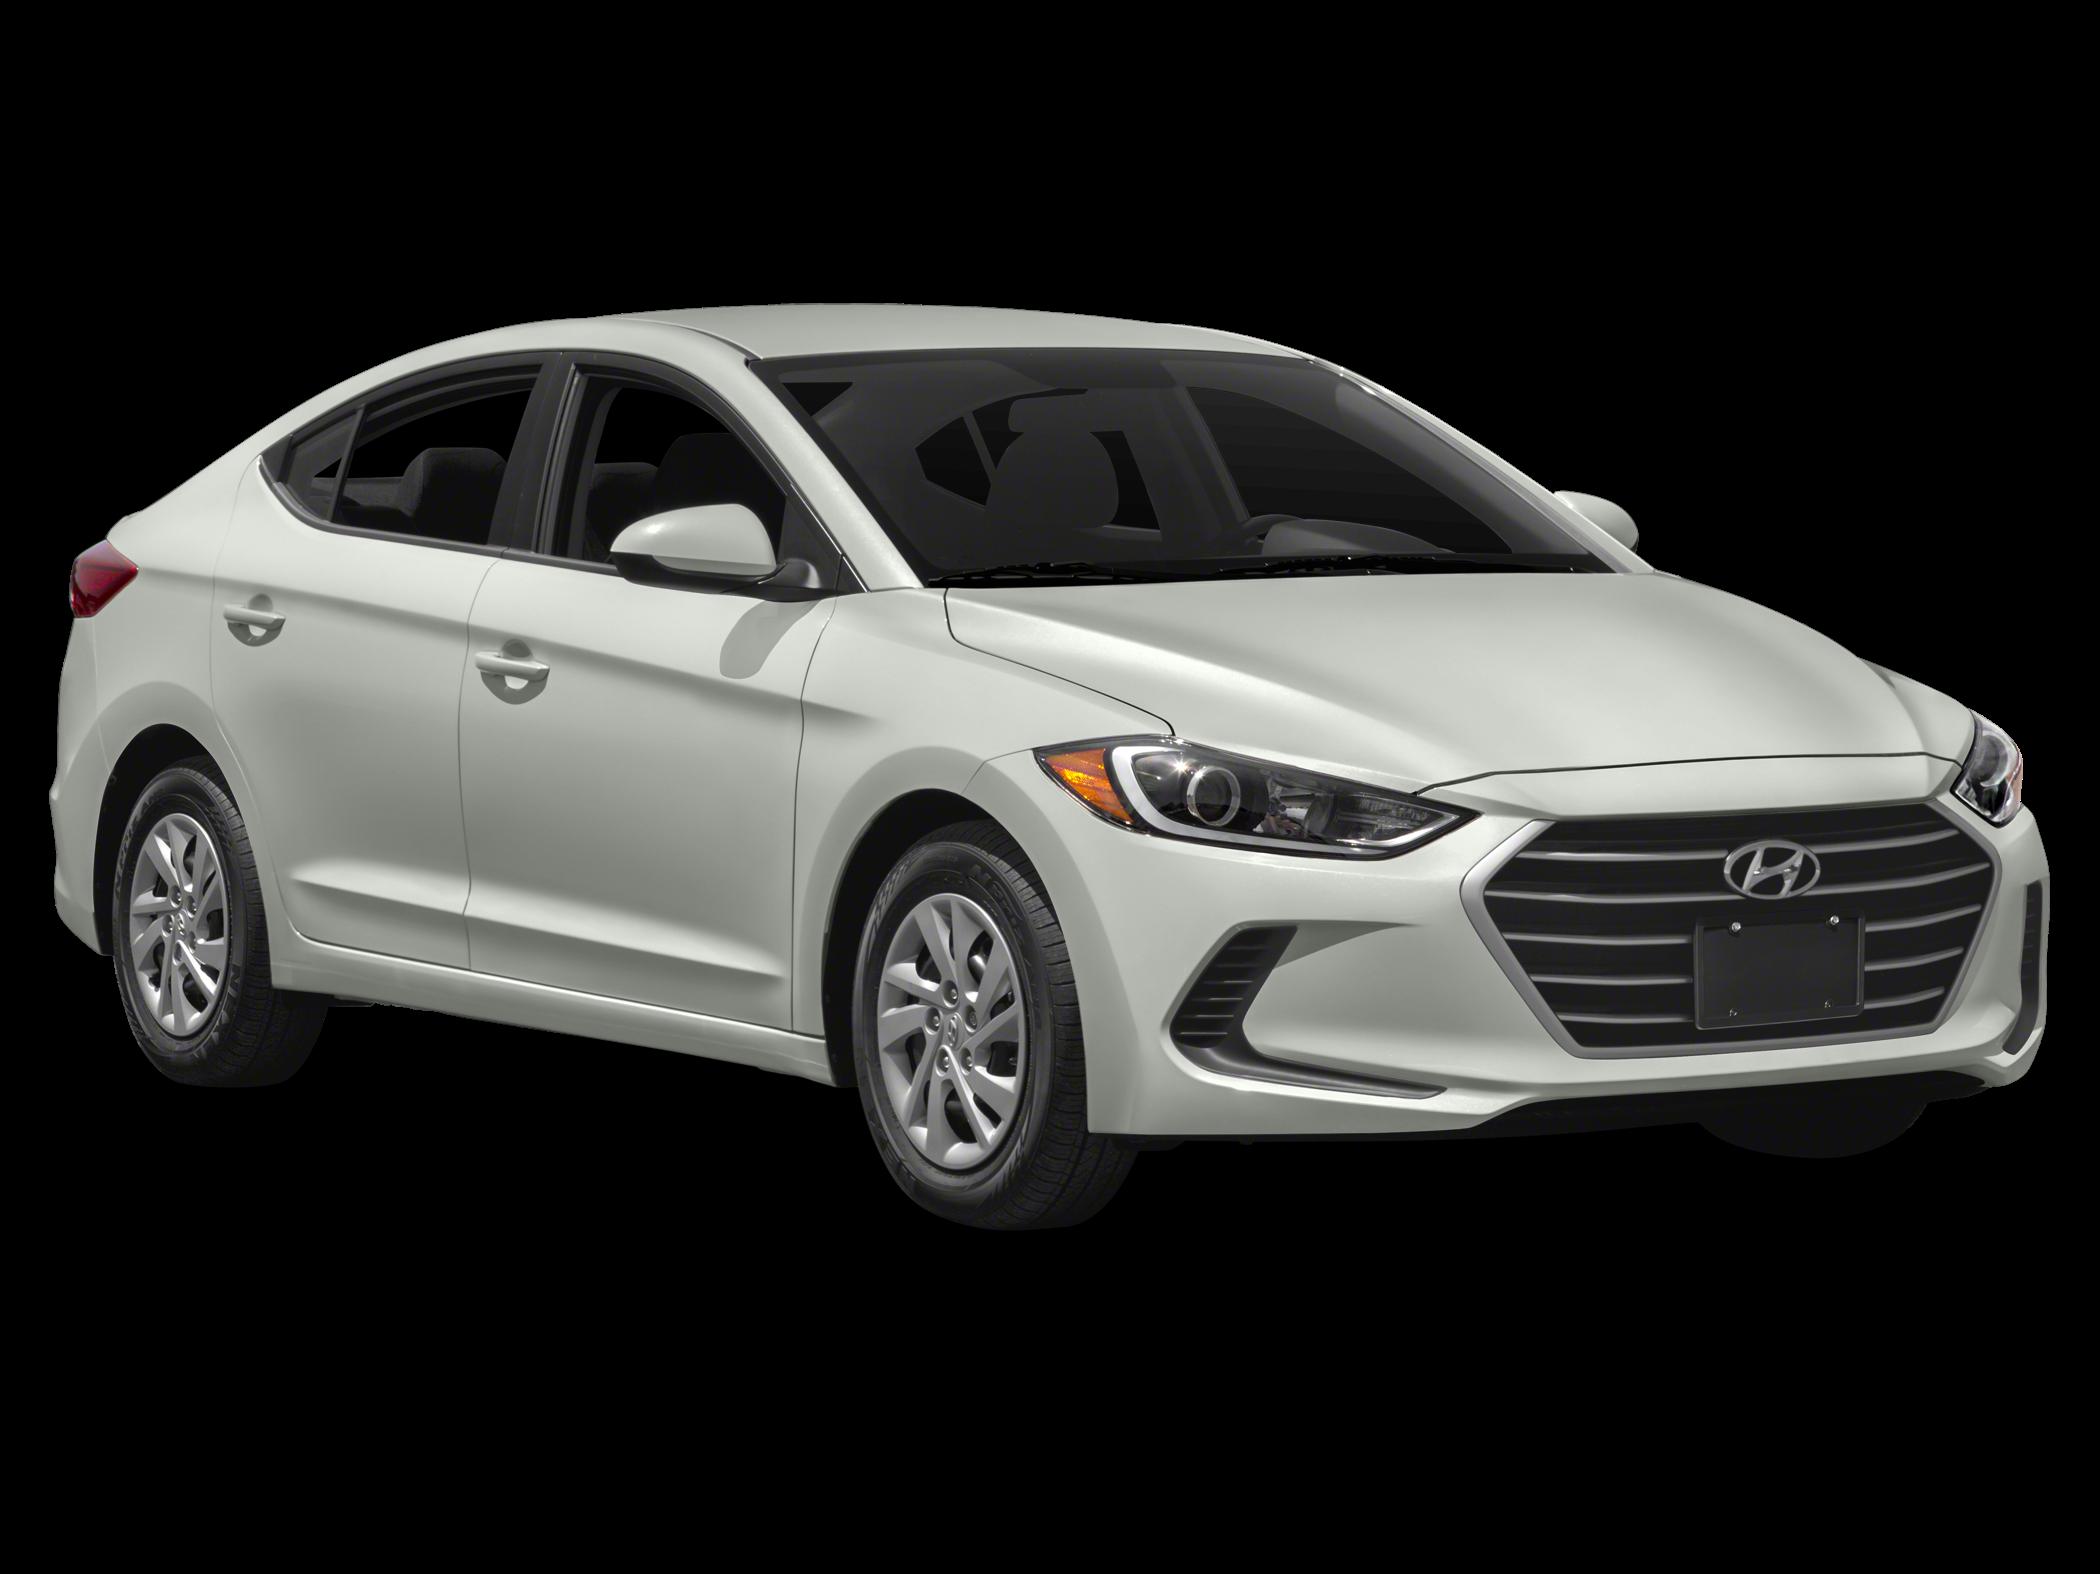 2018 Hyundai Elantra L : Price, Specs & Review   Pine View ...